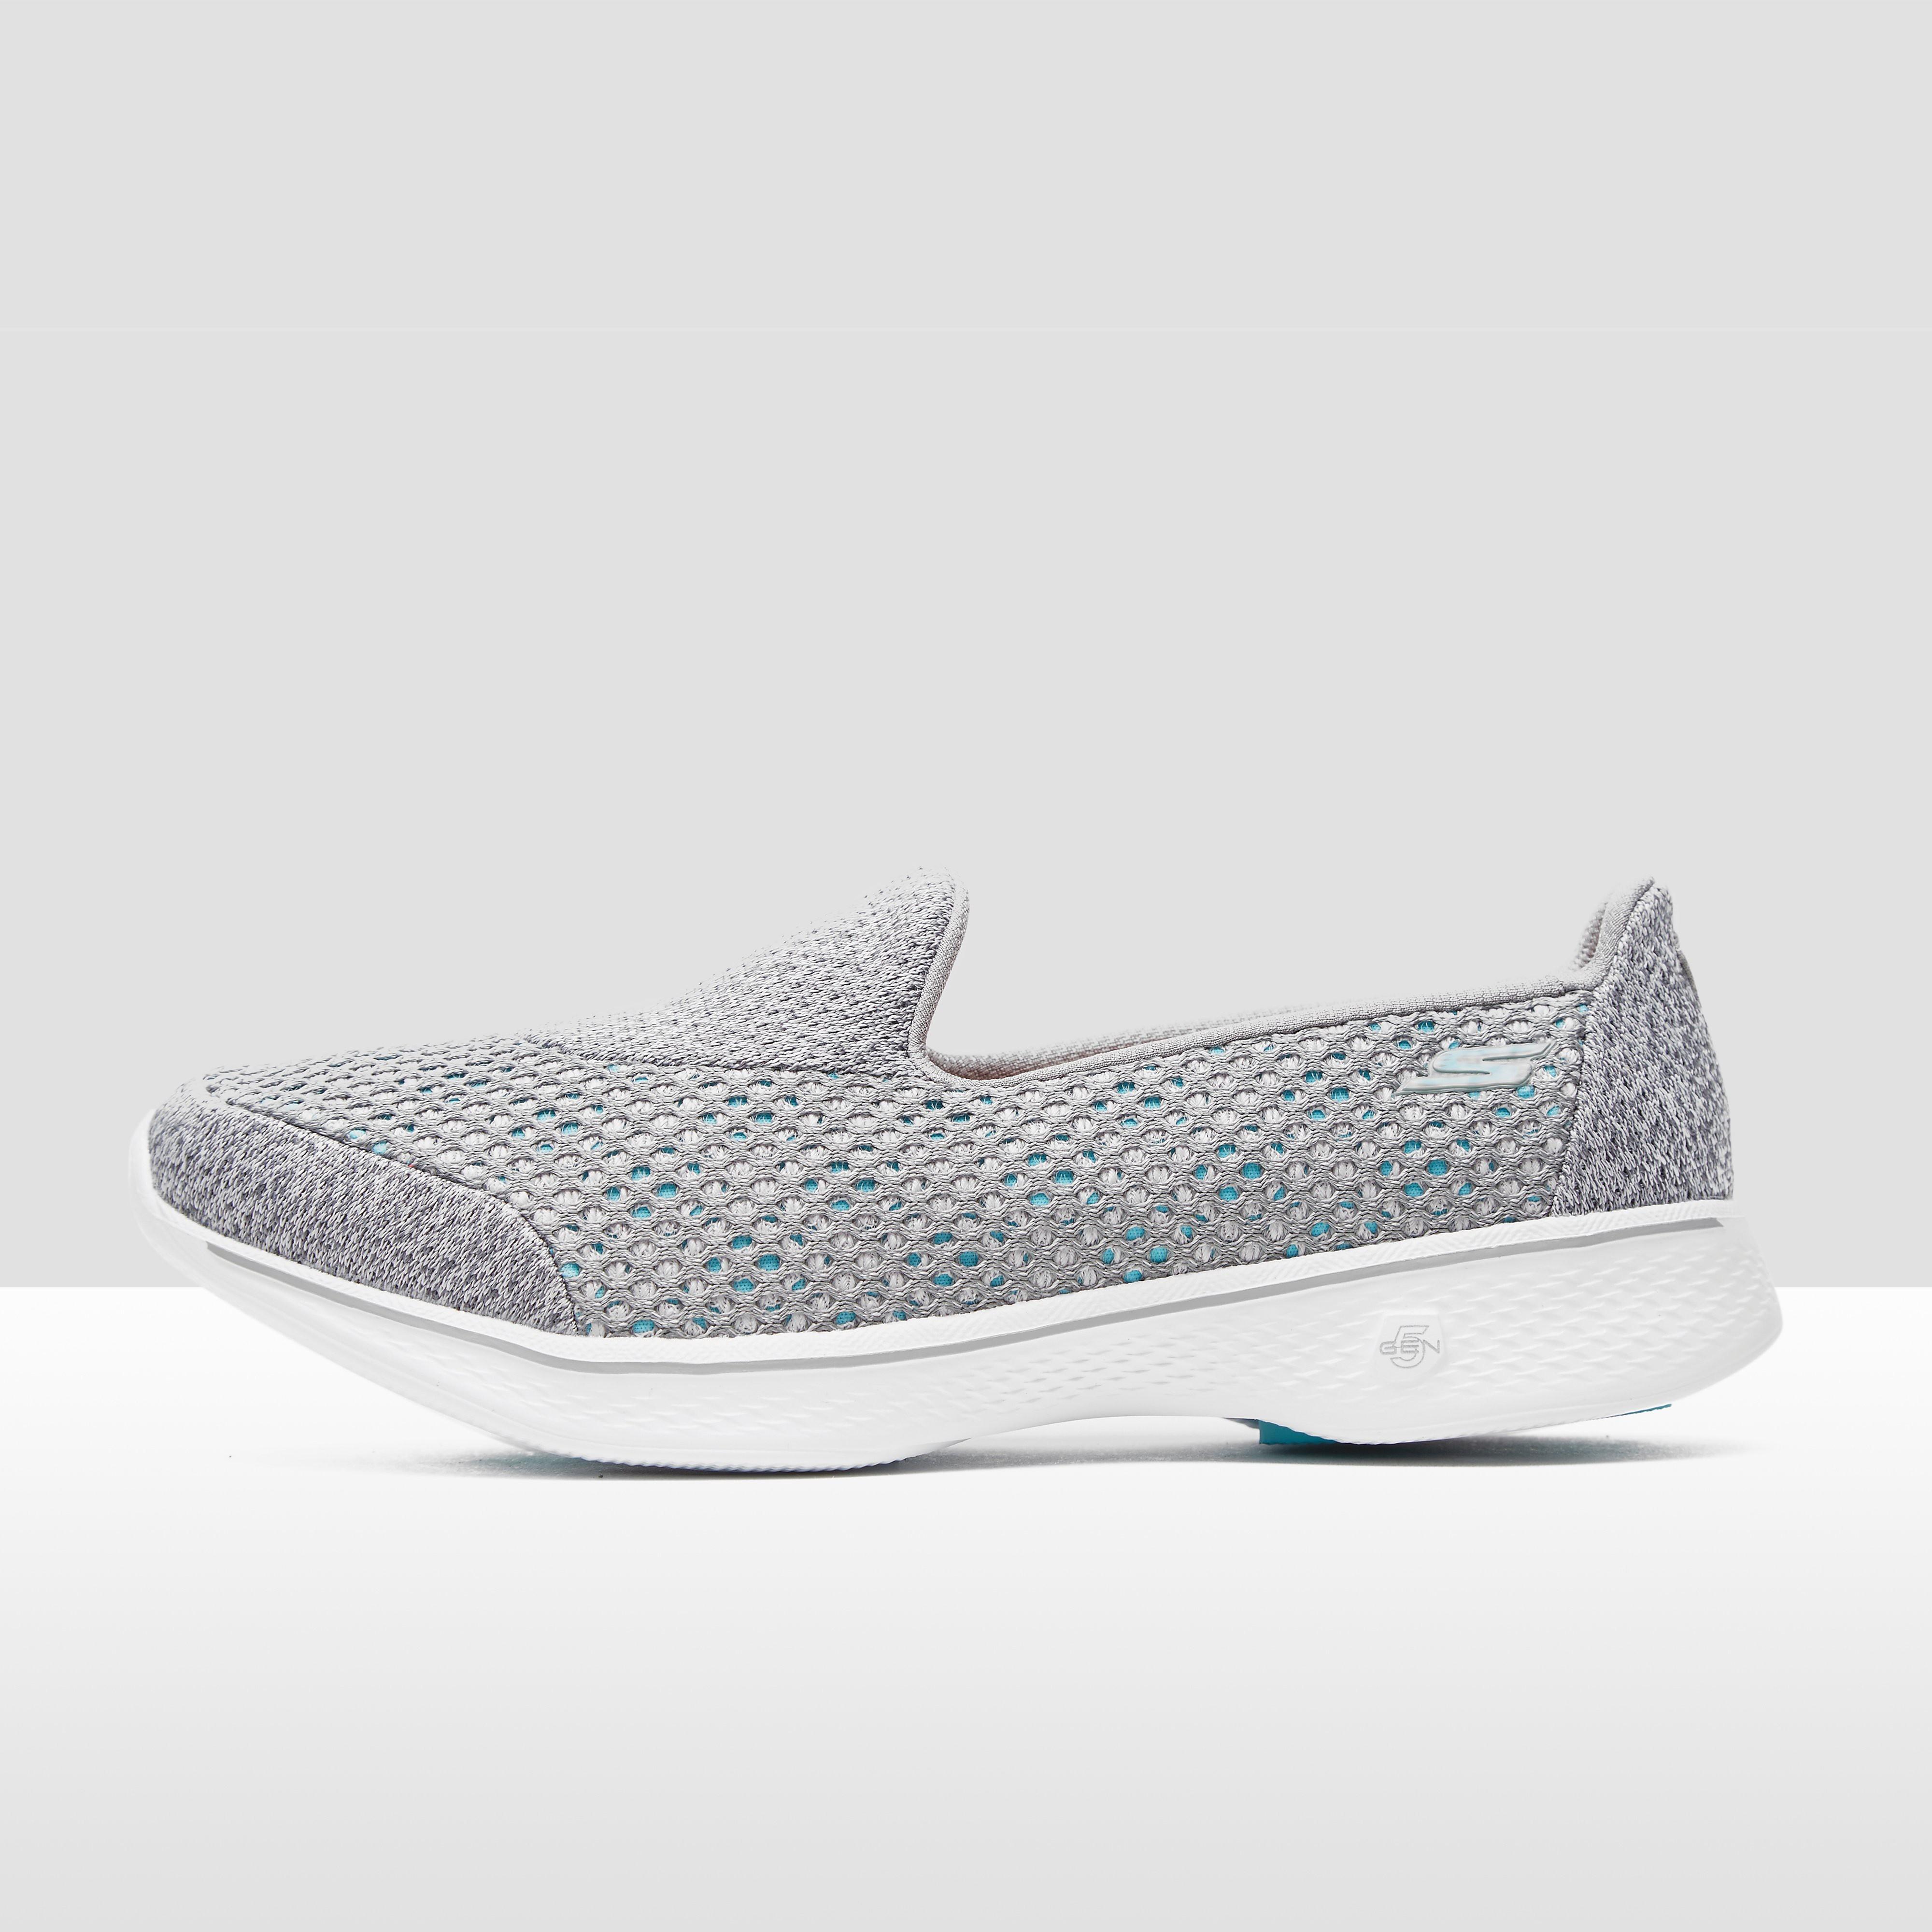 Skechers GOwalk 4- Kindle Women's Casual Shoes